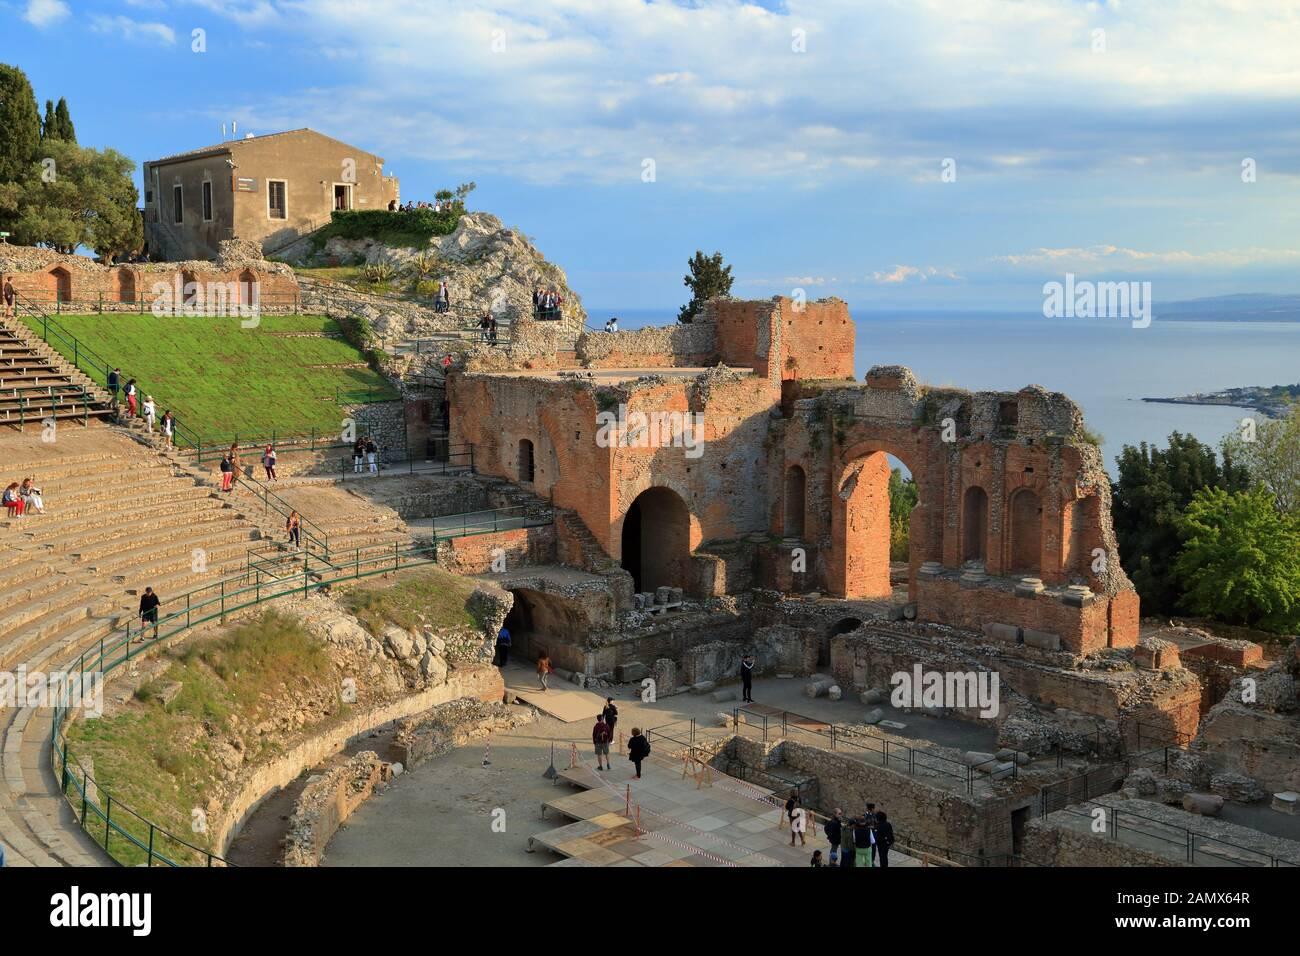 Antiguo teatro griego (Teatro Greco) de Taormina. Teatro antico di Taormina Foto de stock